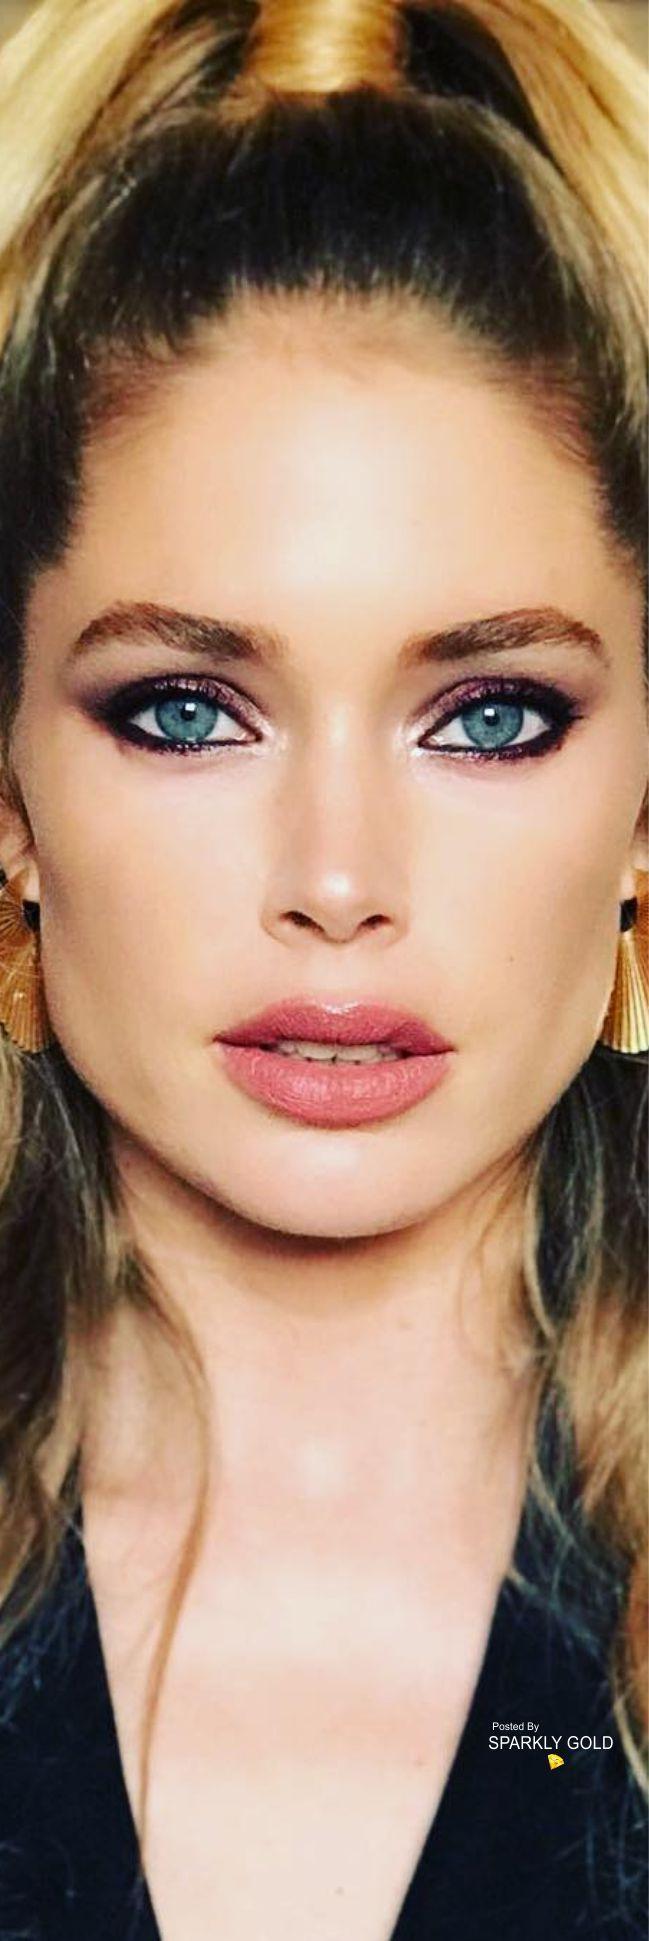 best machiaj images on pinterest beautiful women faces and